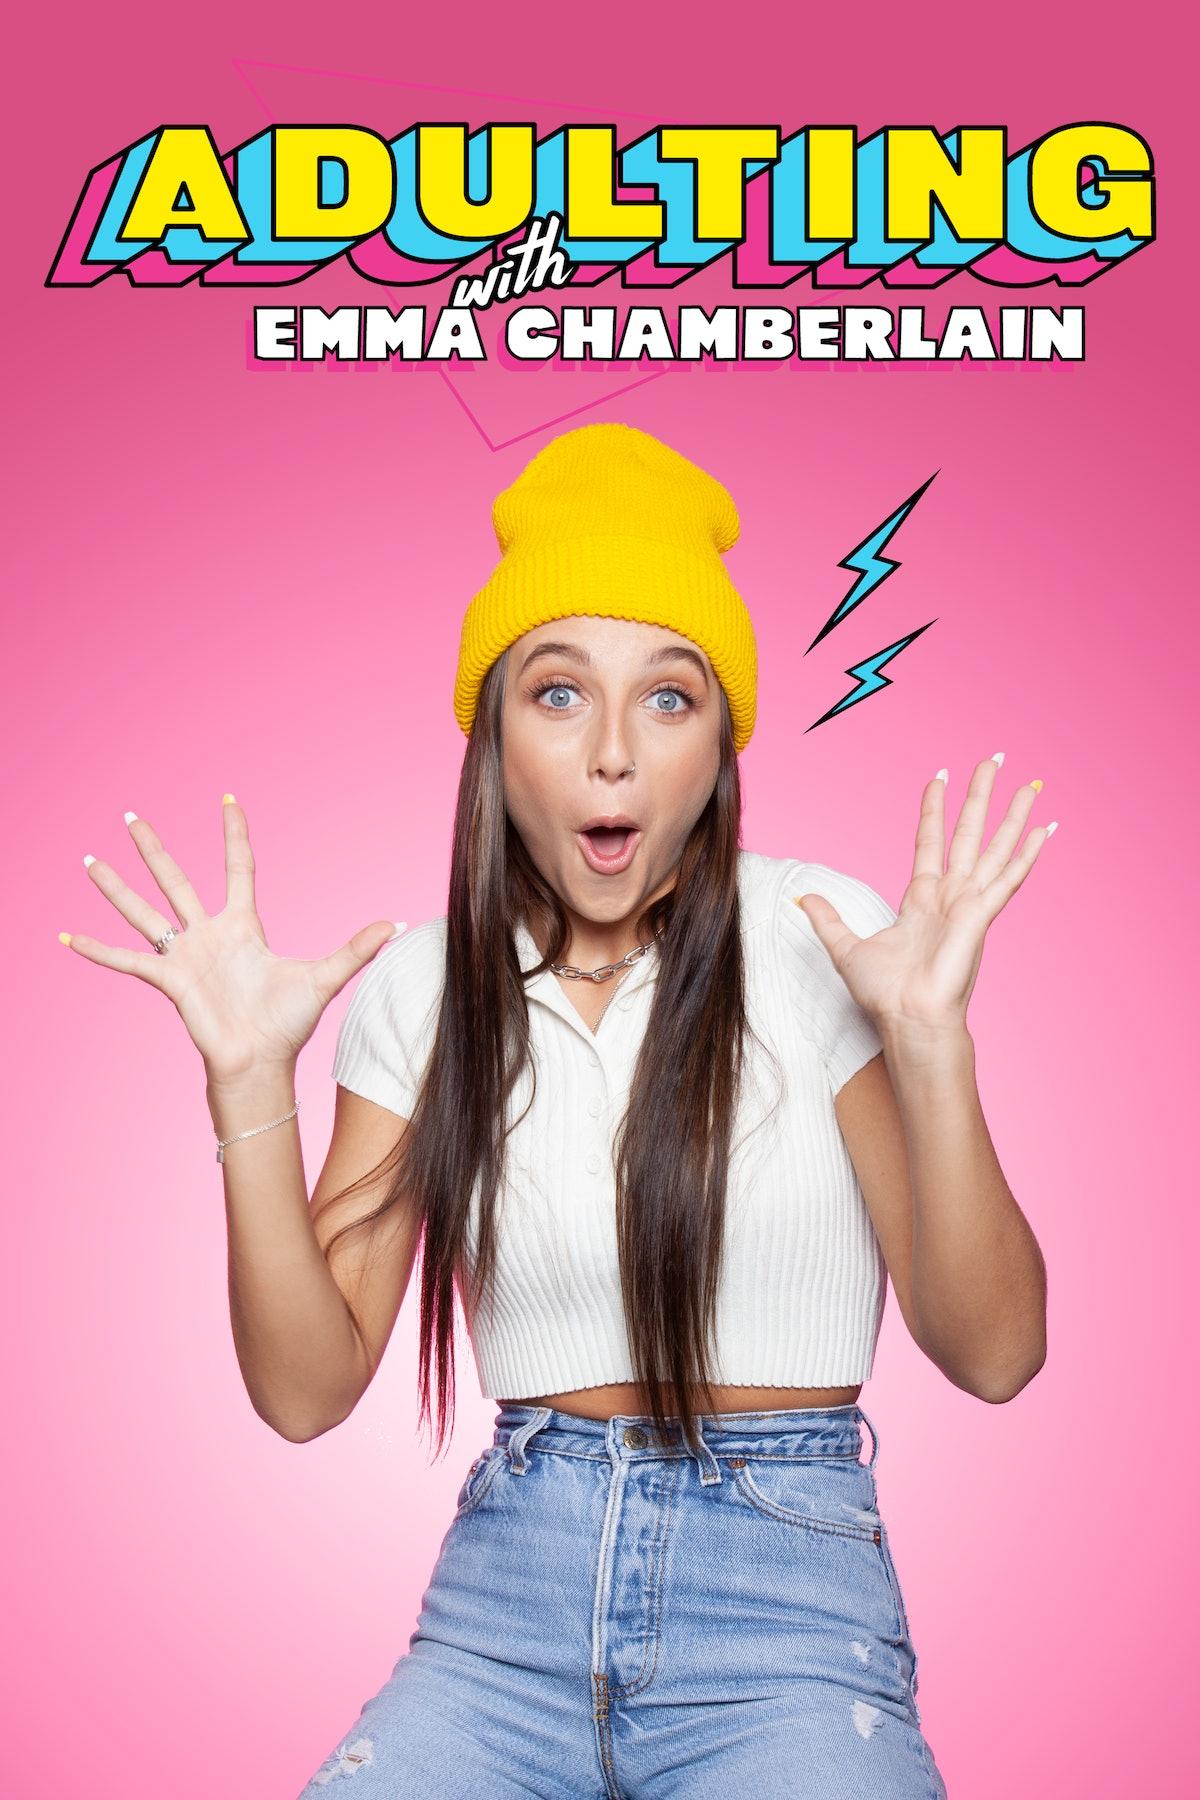 Emma Chamberlain Snapchat series 'Adulting'